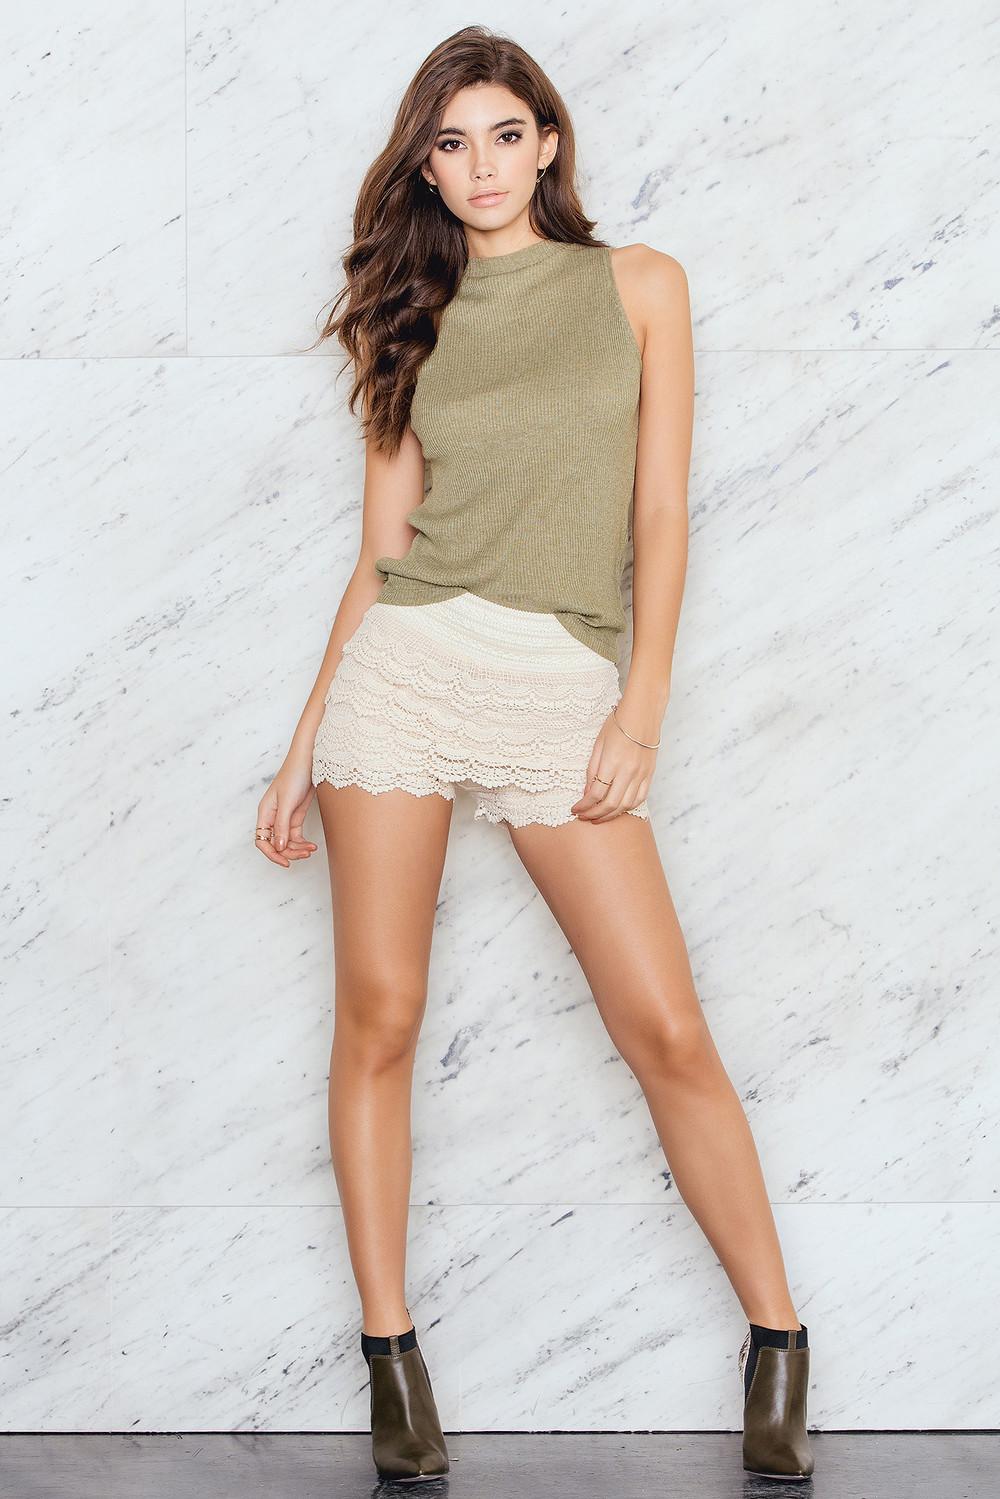 Hot Anatomy Shorts Lace